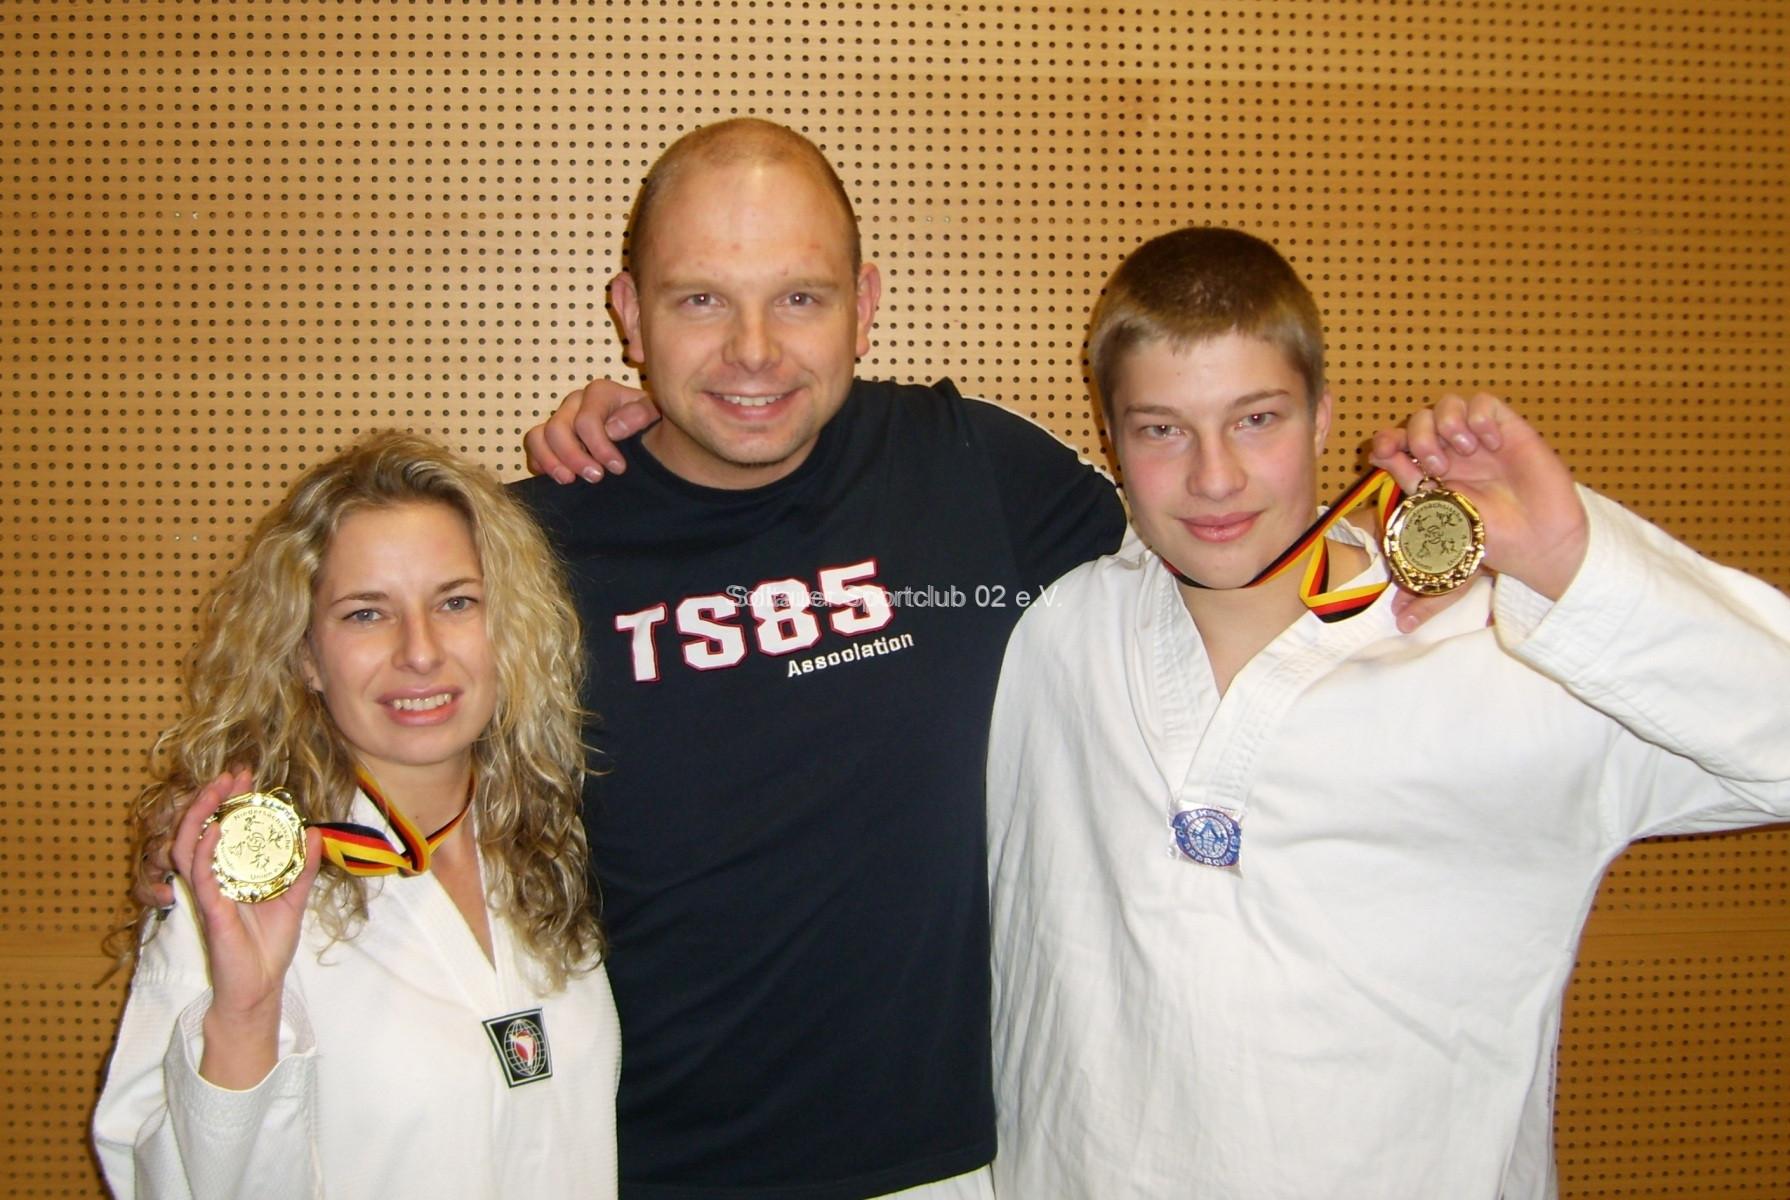 bericht-bild-tkd-soltauer-taekwondokas-holen-zweimal-gold-bei-landesturnier